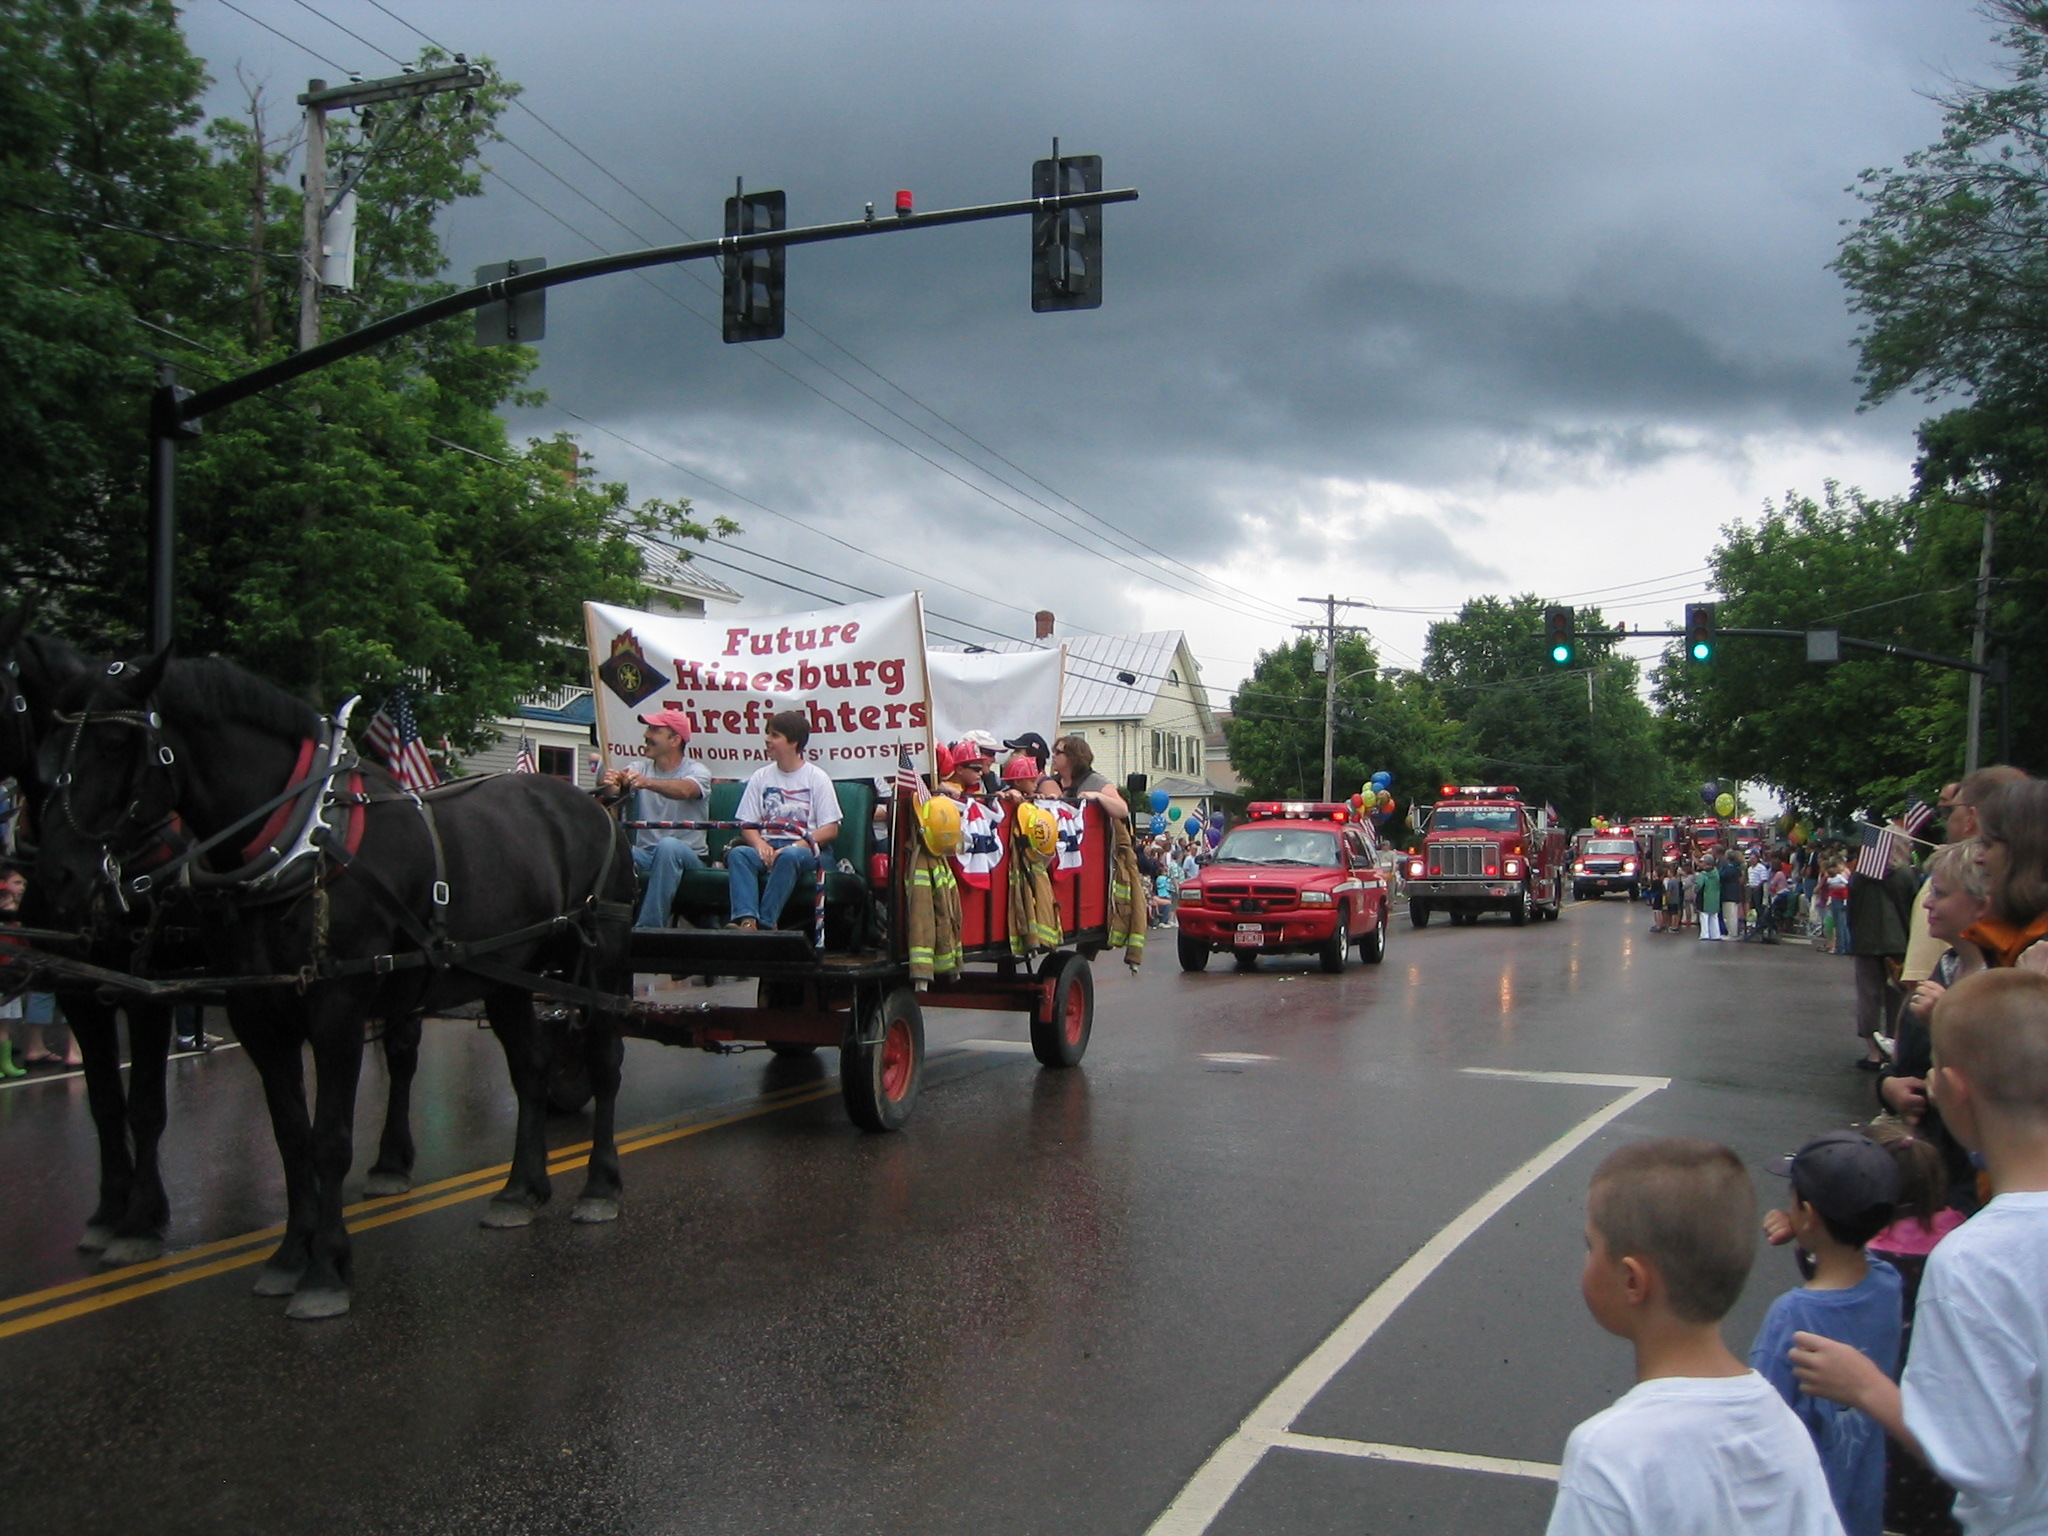 Hinesburg Firetrucks on the Way